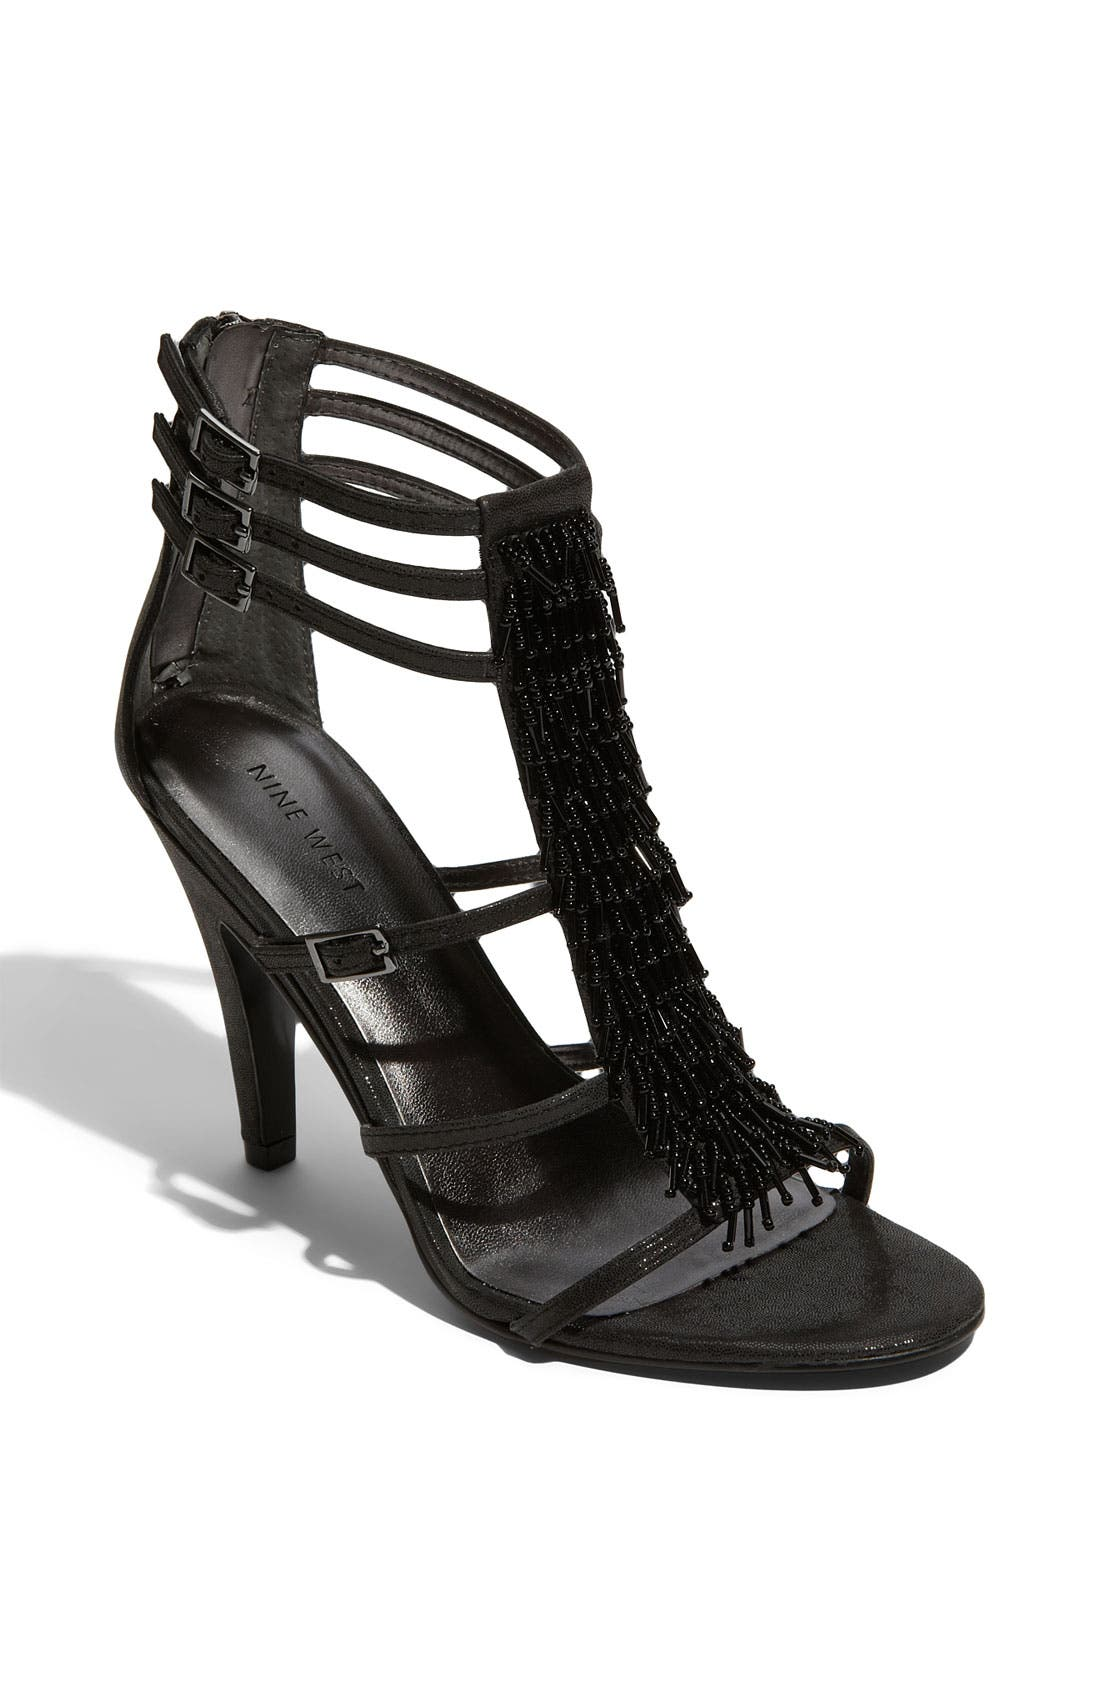 Alternate Image 1 Selected - Nine West 'Barclay' Sandal